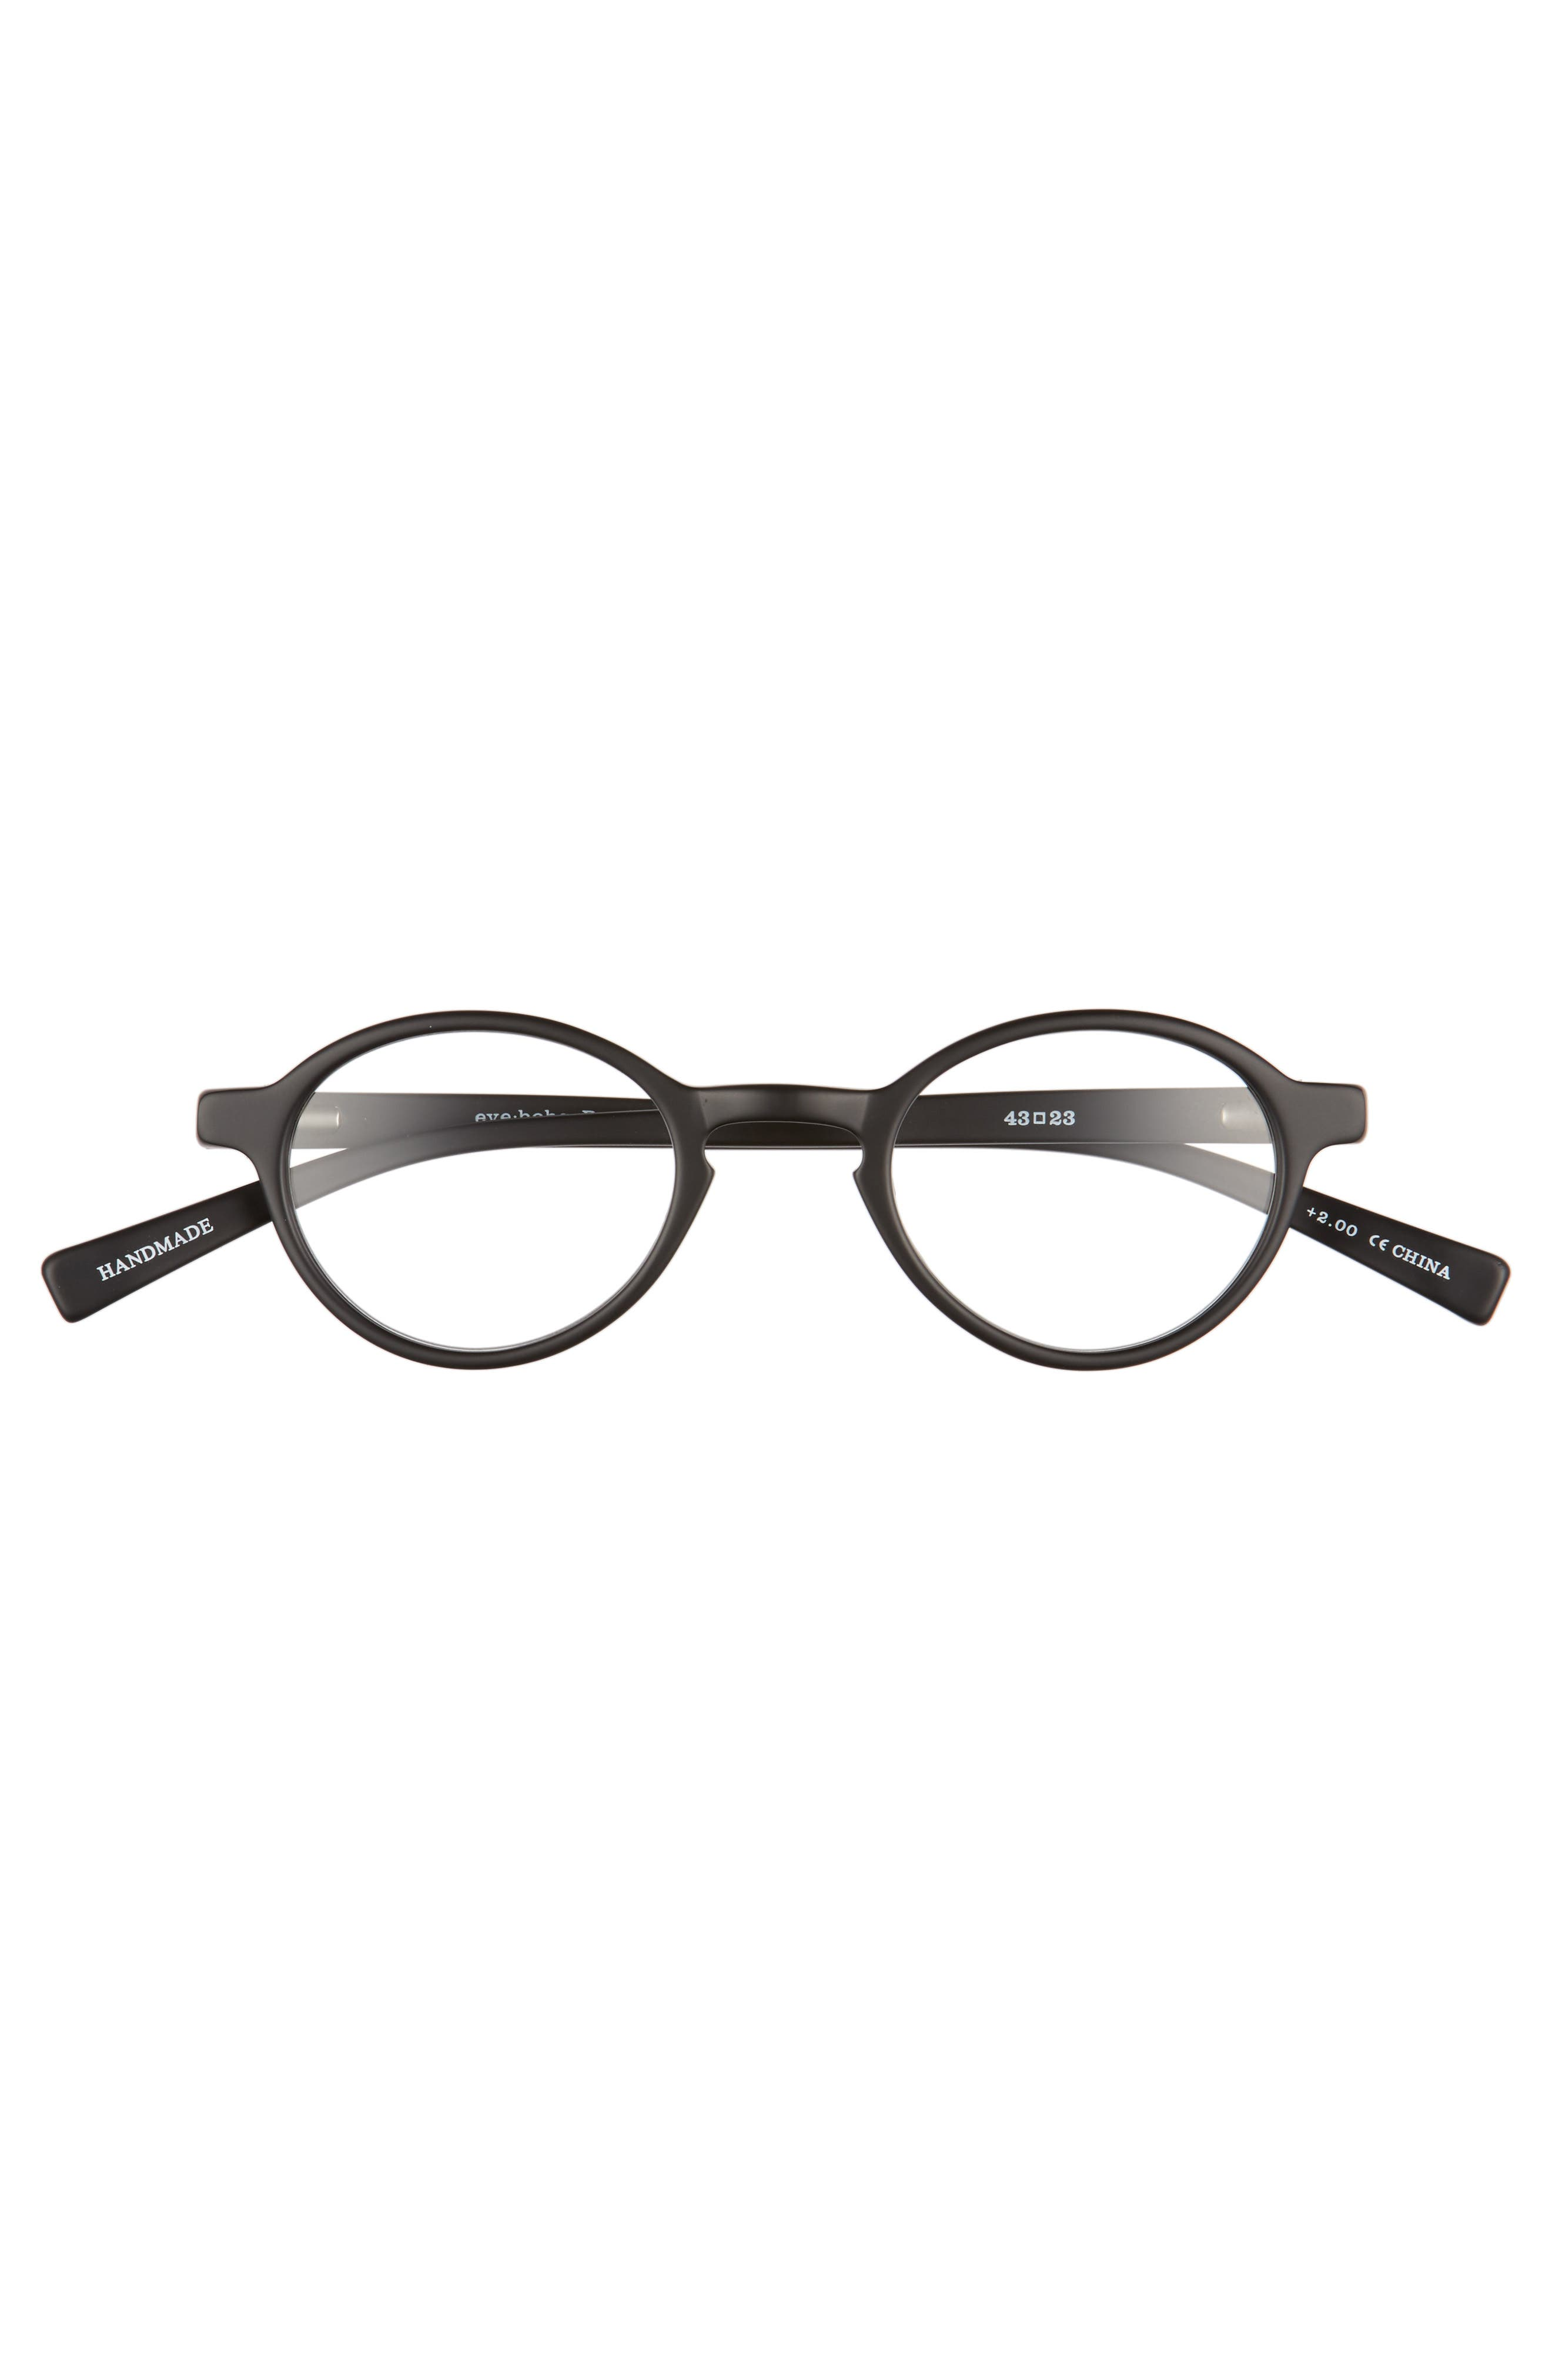 Board Stiff 43mm Reading Glasses,                             Alternate thumbnail 2, color,                             MATTE BLACK